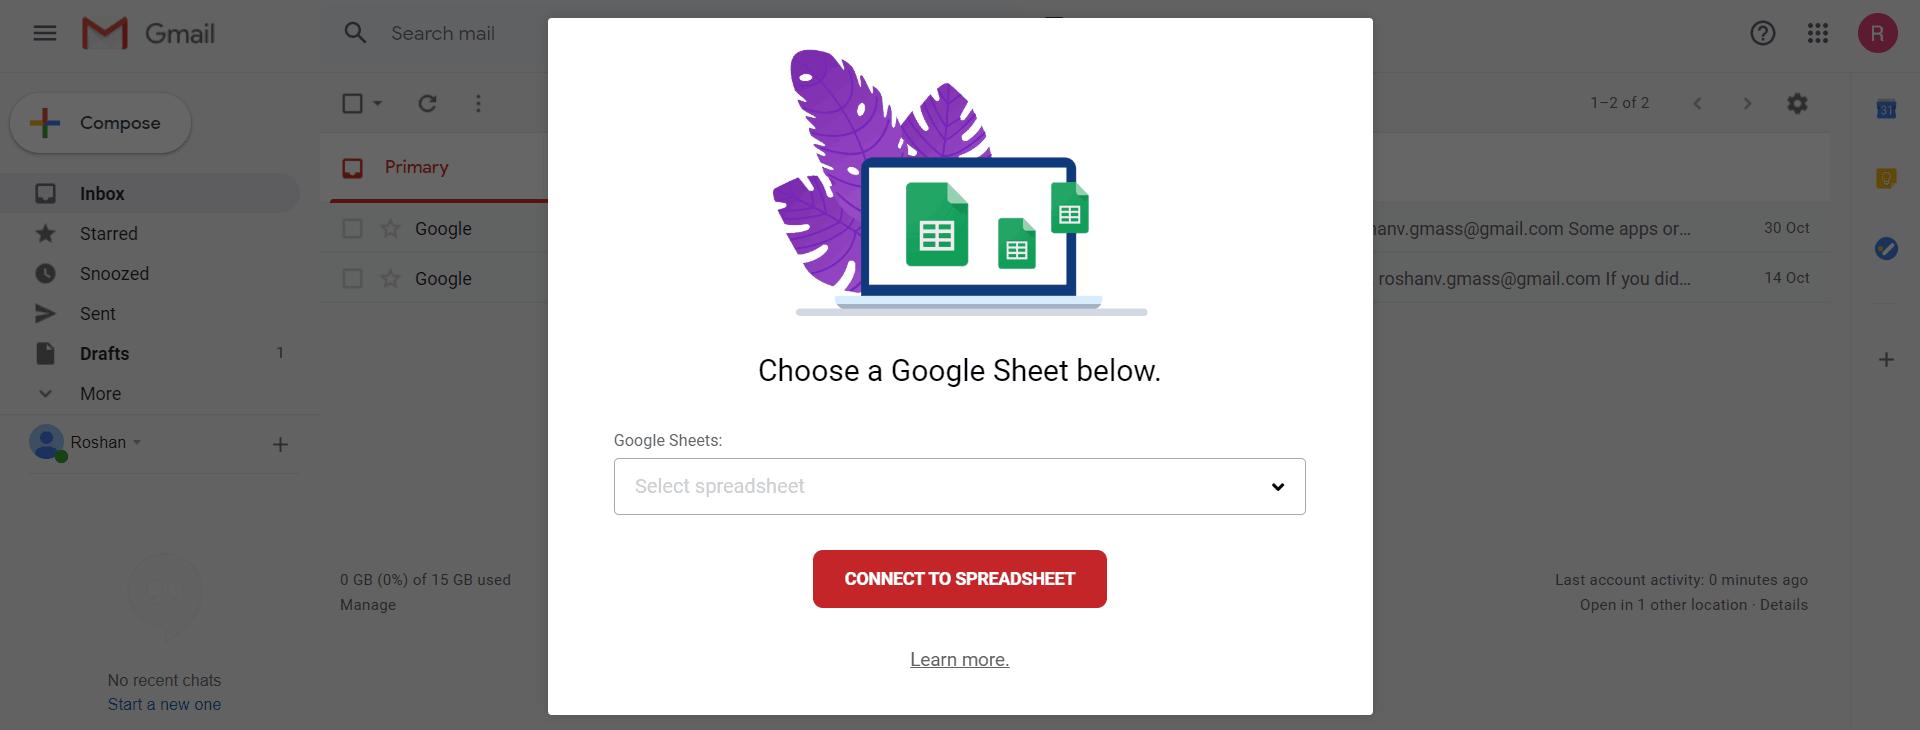 Connect GMass to Google Sheets dialog box.